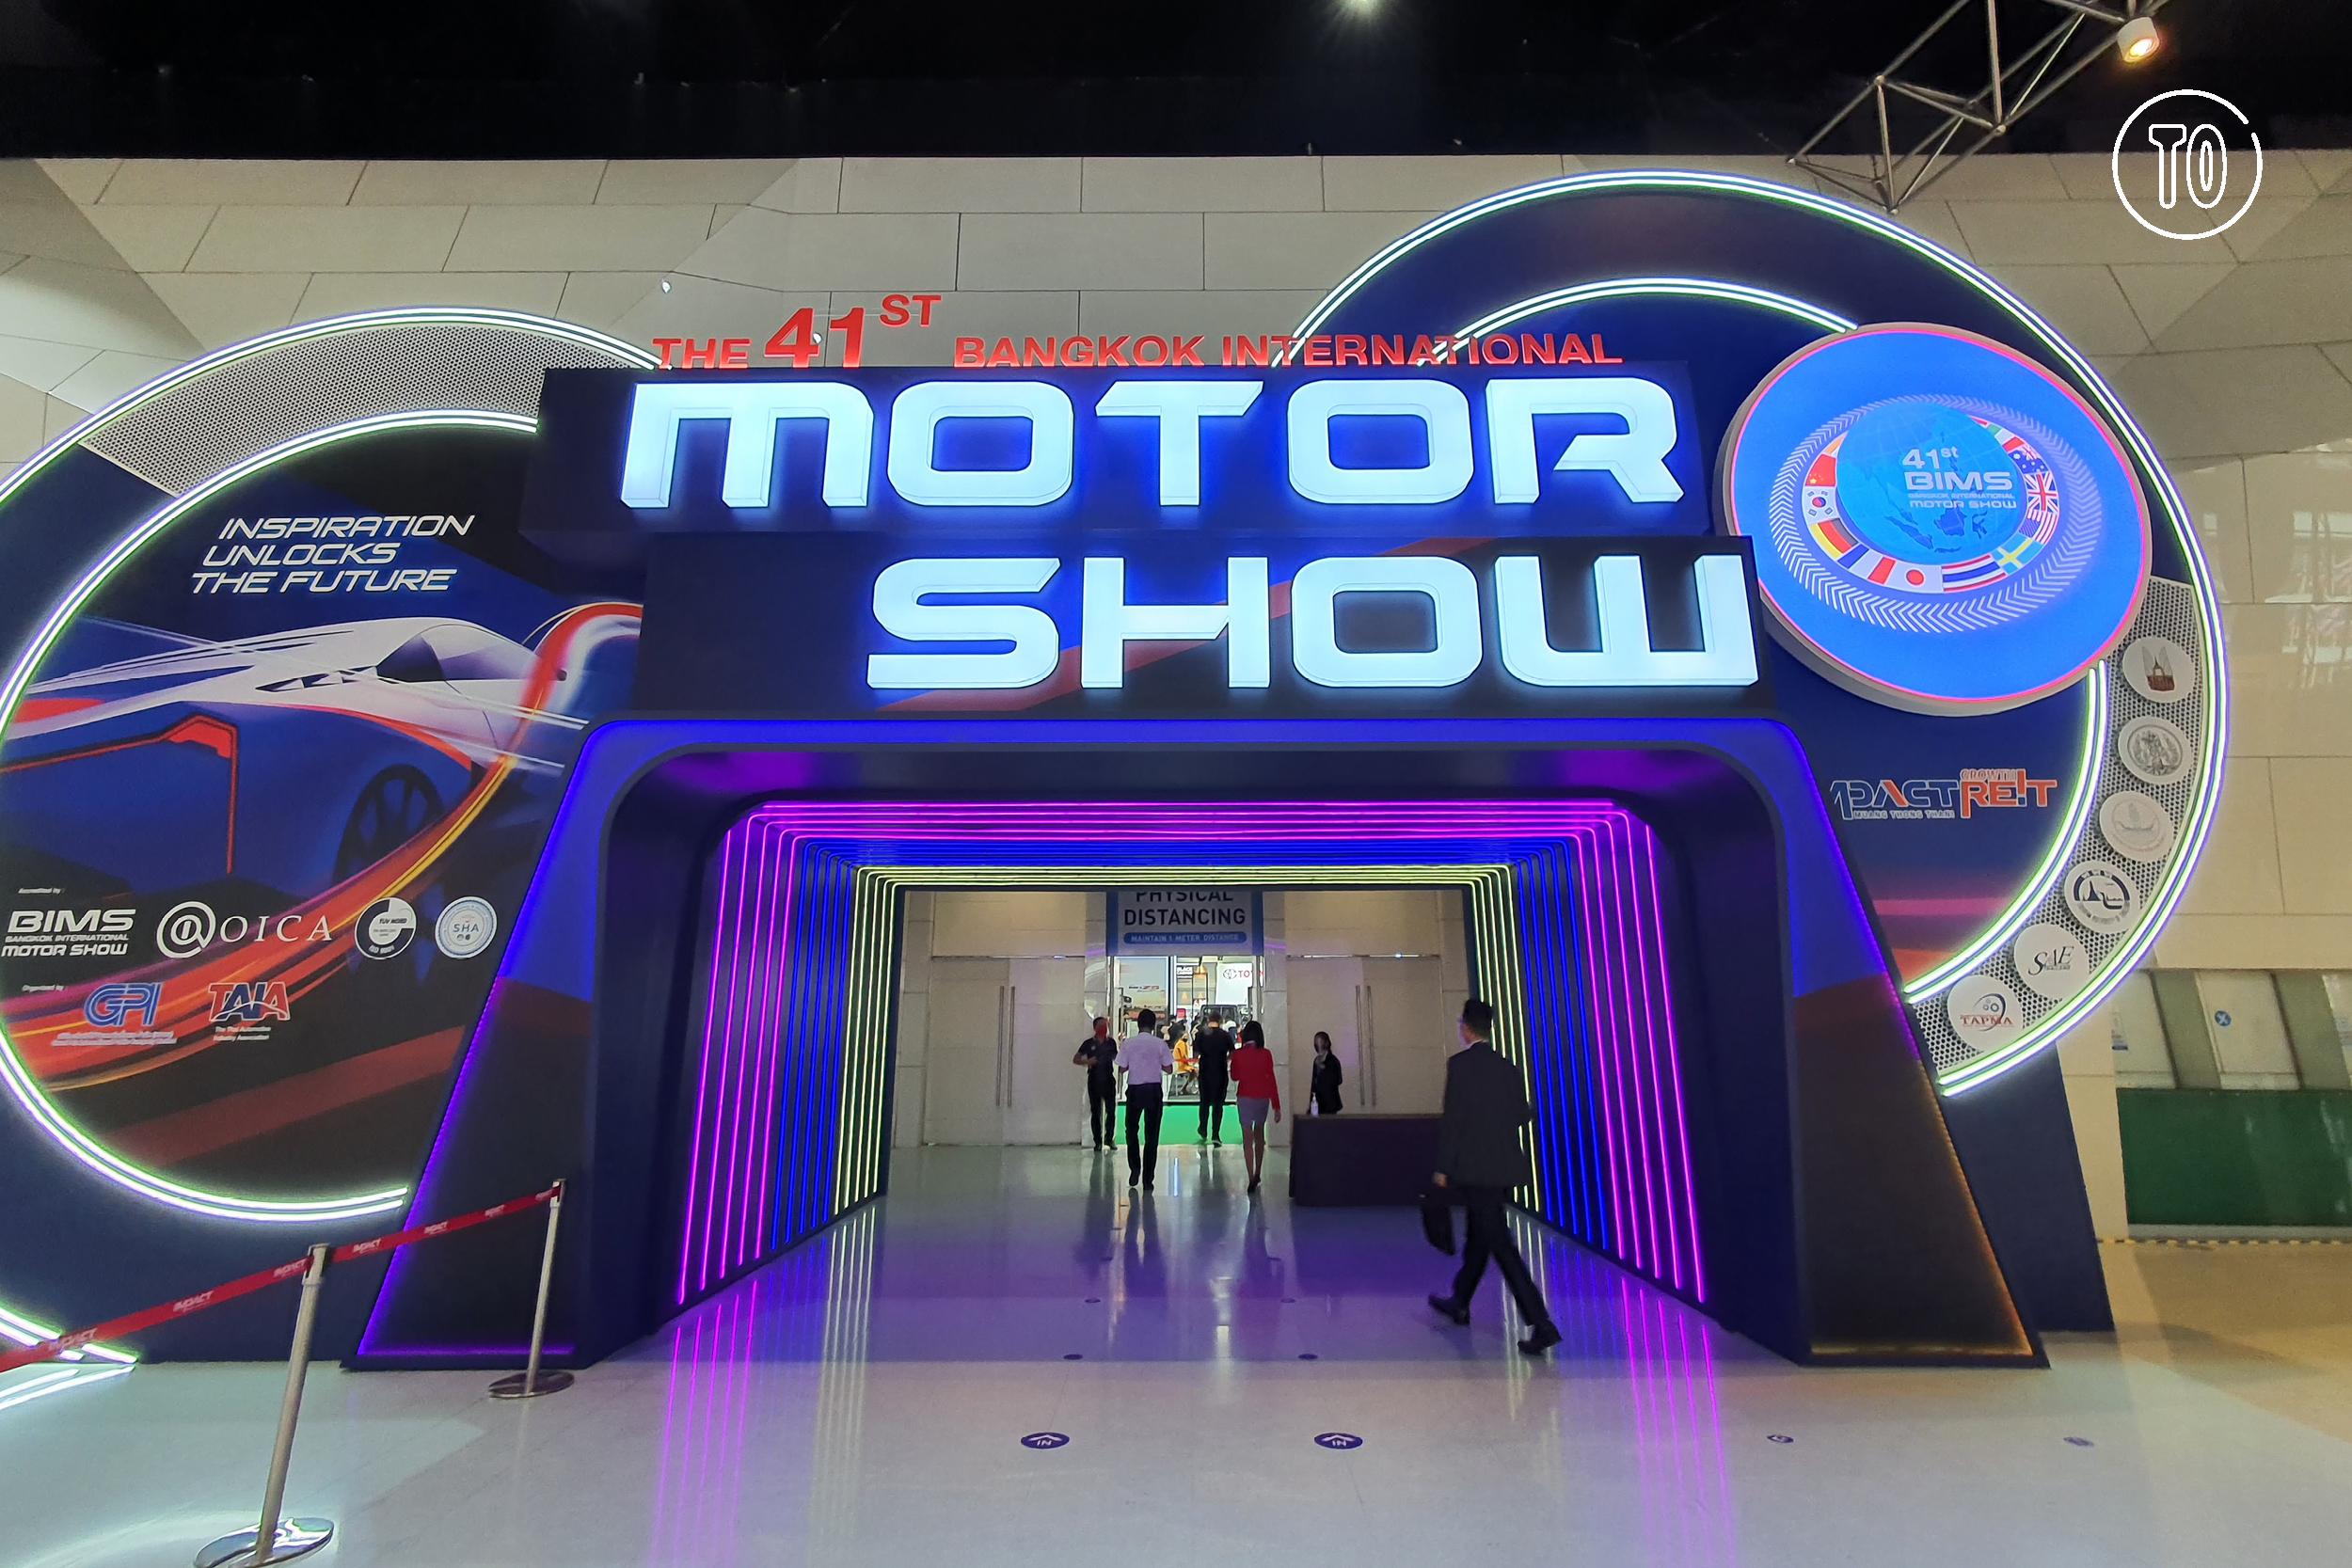 Motor Show 2020: มหกรรมที่ขับเคลื่อนธุรกิจยานยนต์ท่ามกลางสถานการณ์โรคระบาด